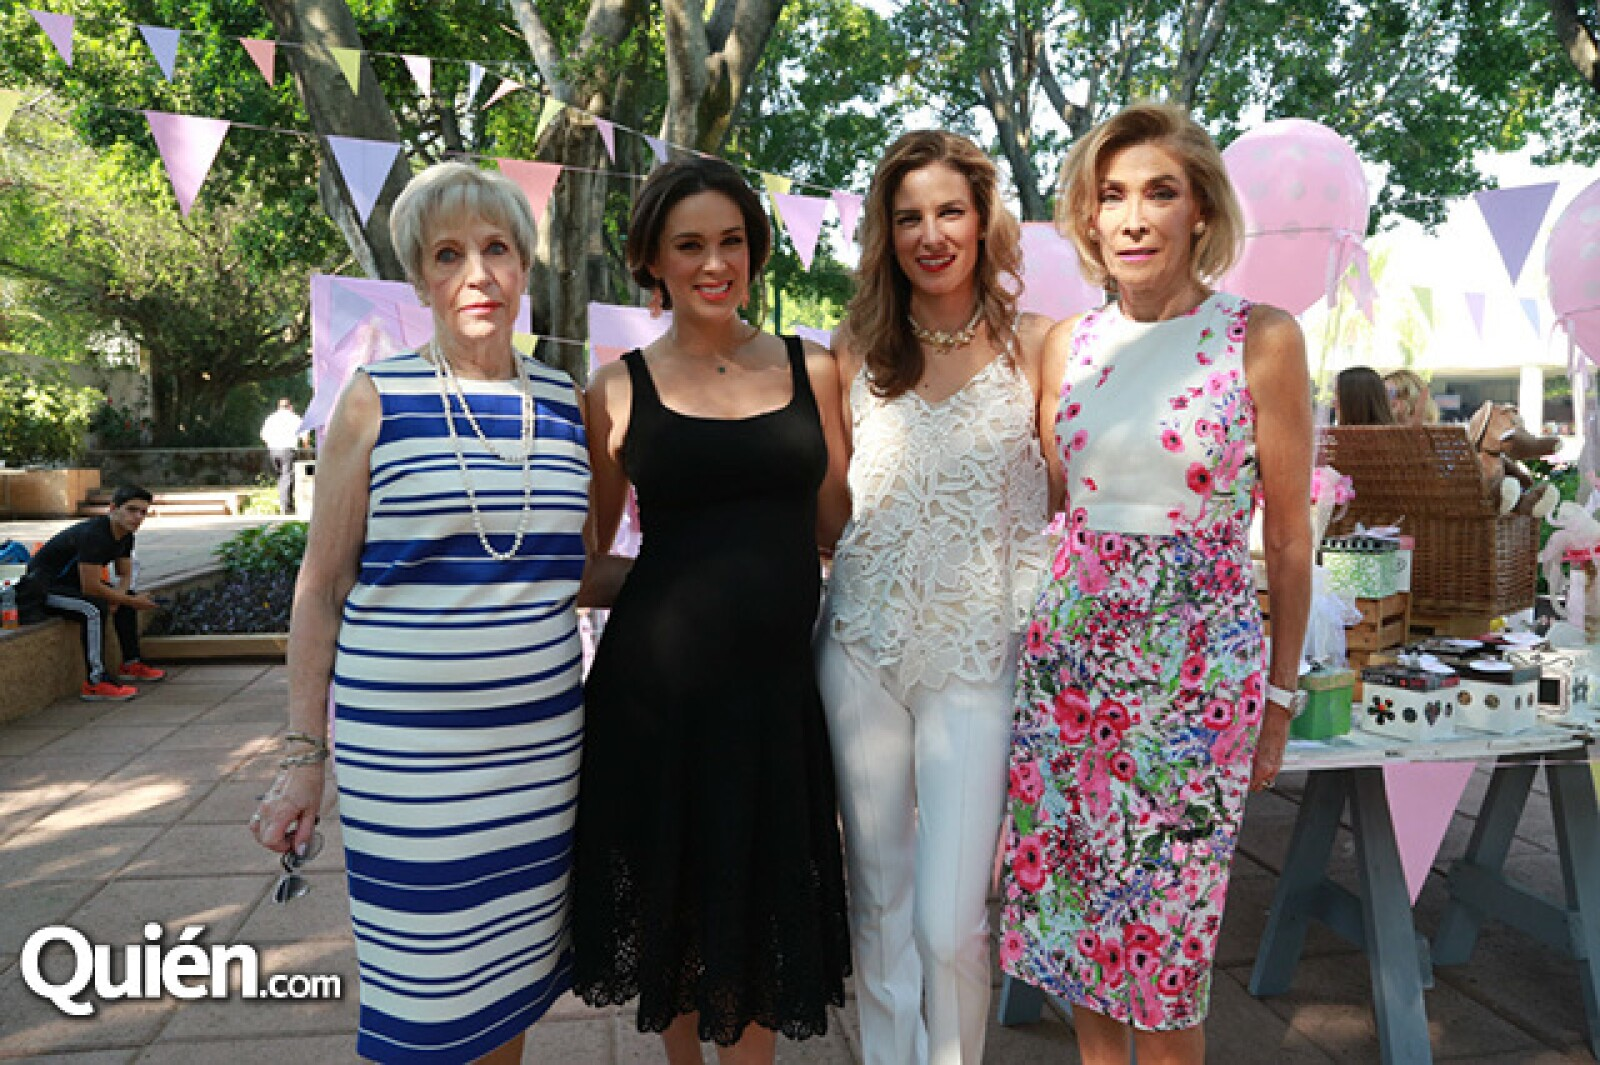 Virginia Fuentes, Jacqueline Van Hoorde, Jacky Bracamontes y Alina Bracamontes